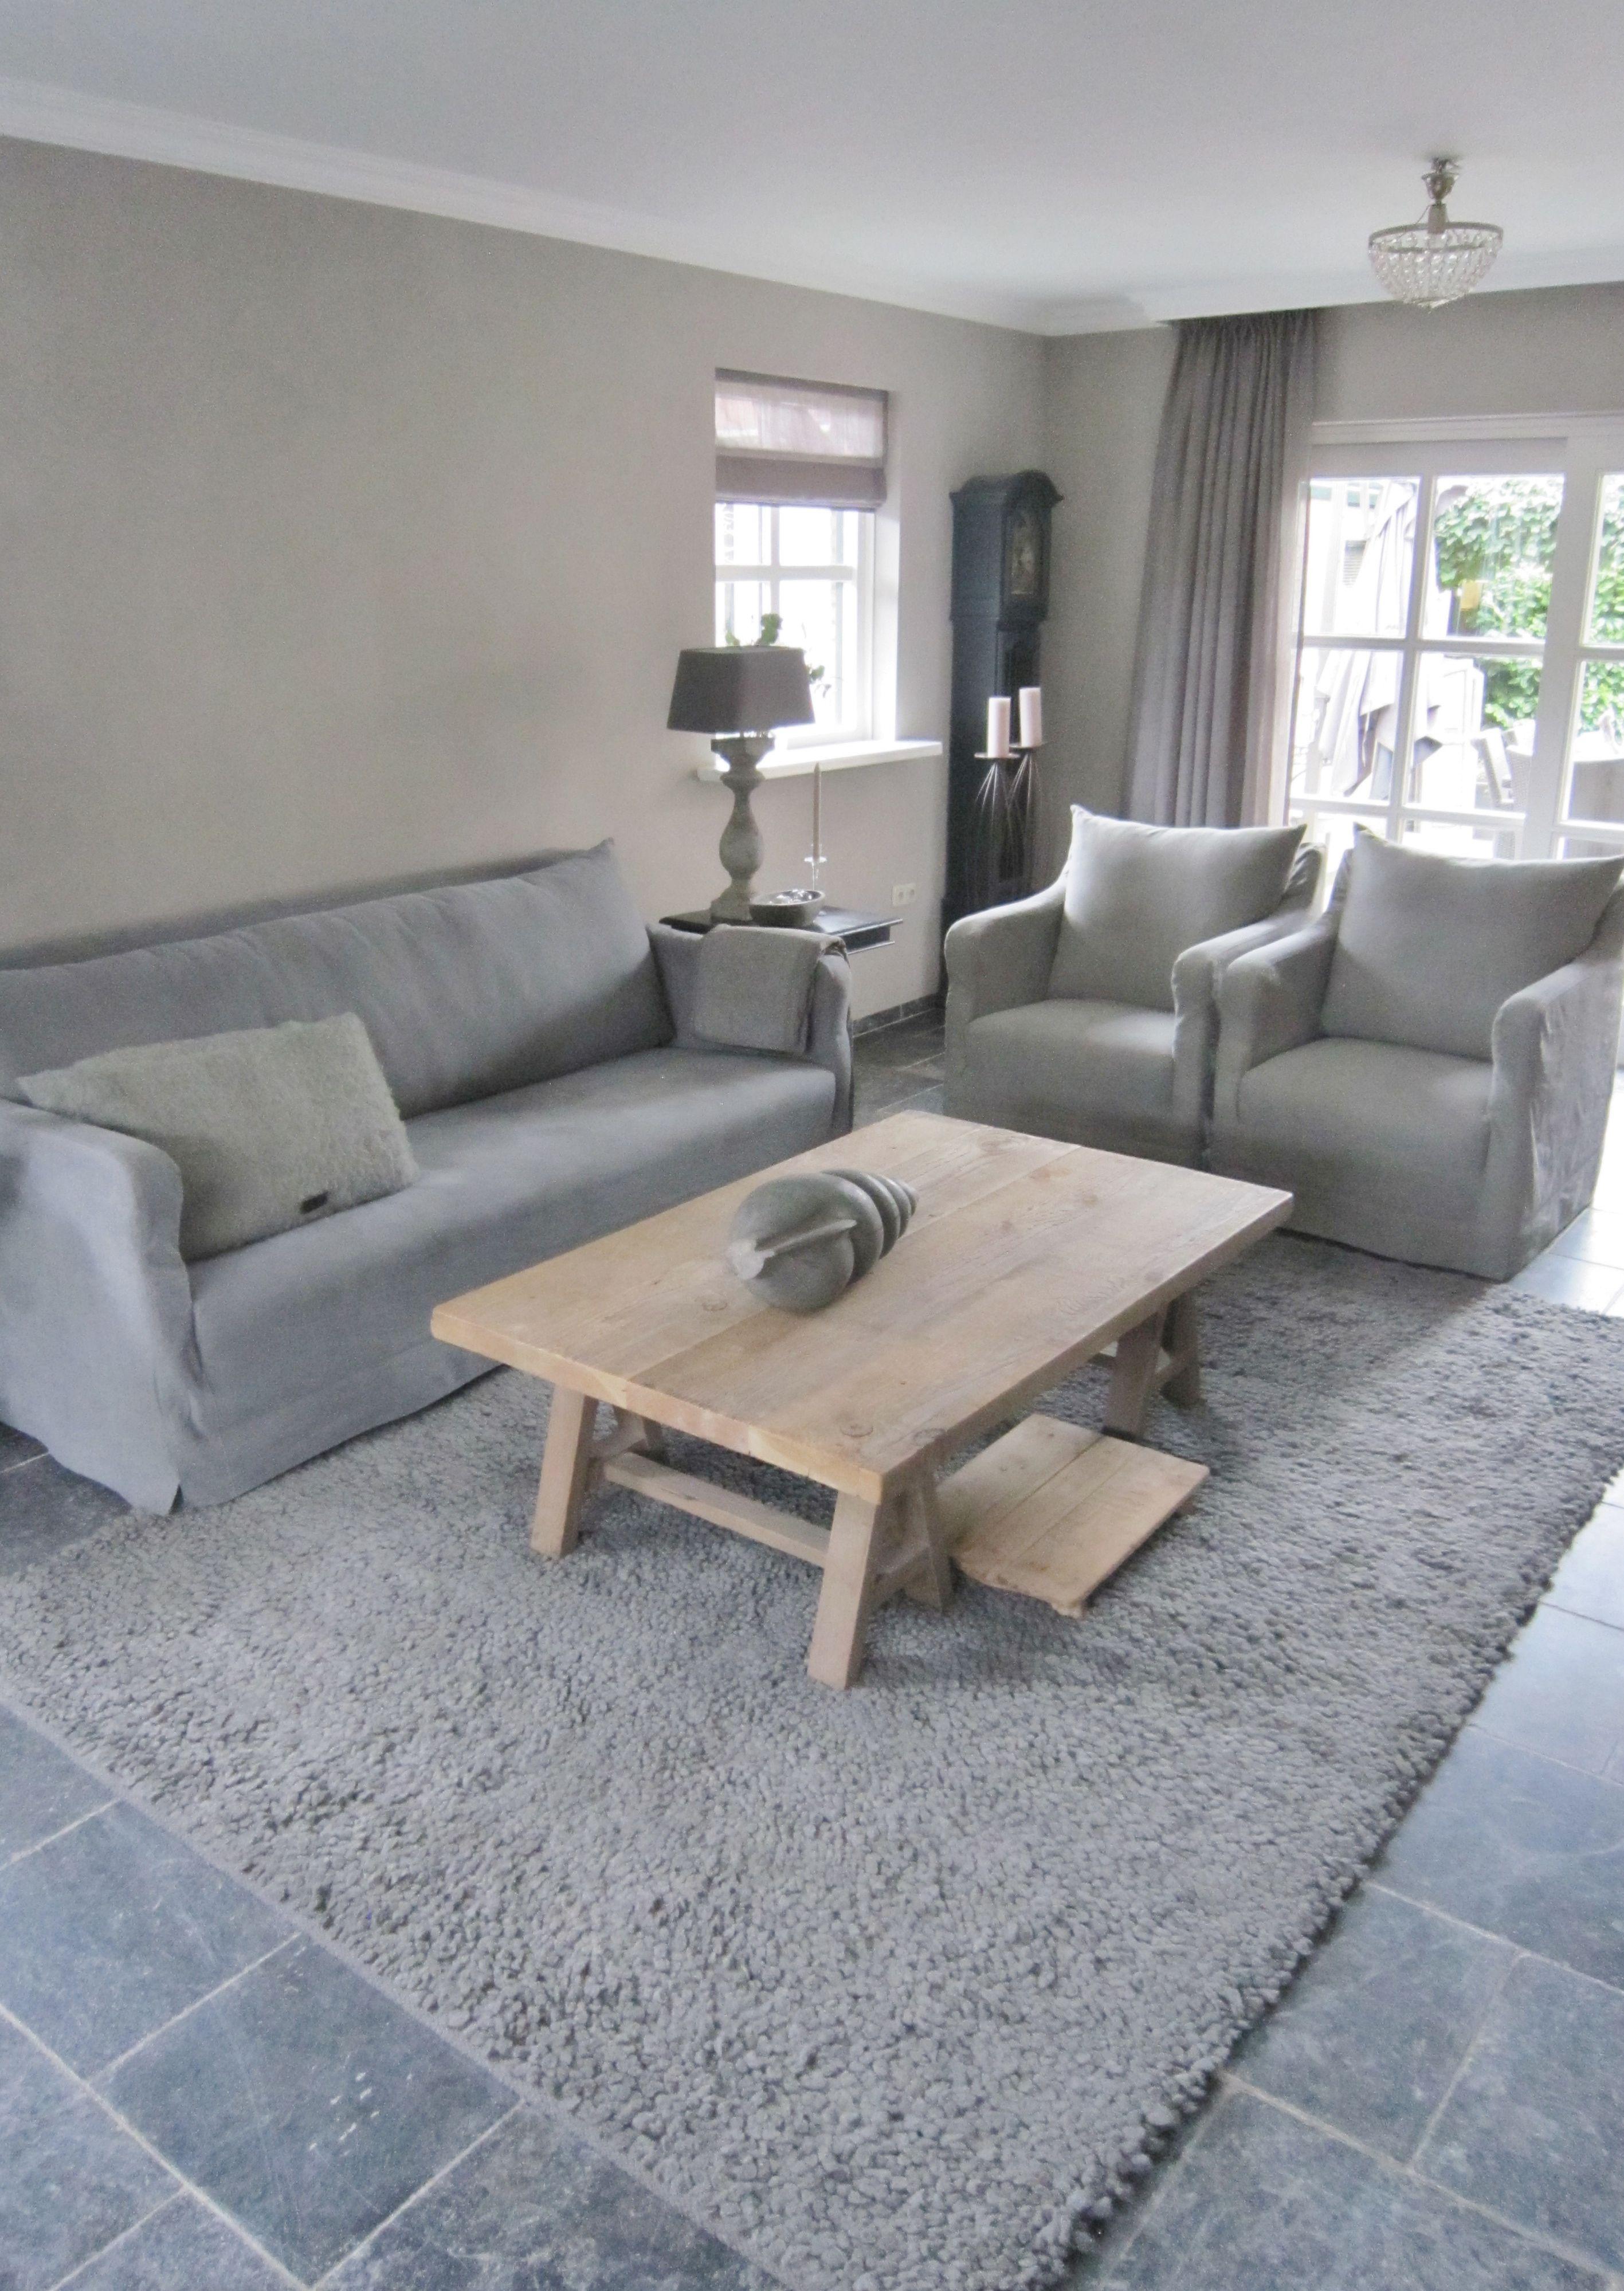 mia colore kalkverf cred mt sfeeridee wohnen pinterest wohnen. Black Bedroom Furniture Sets. Home Design Ideas